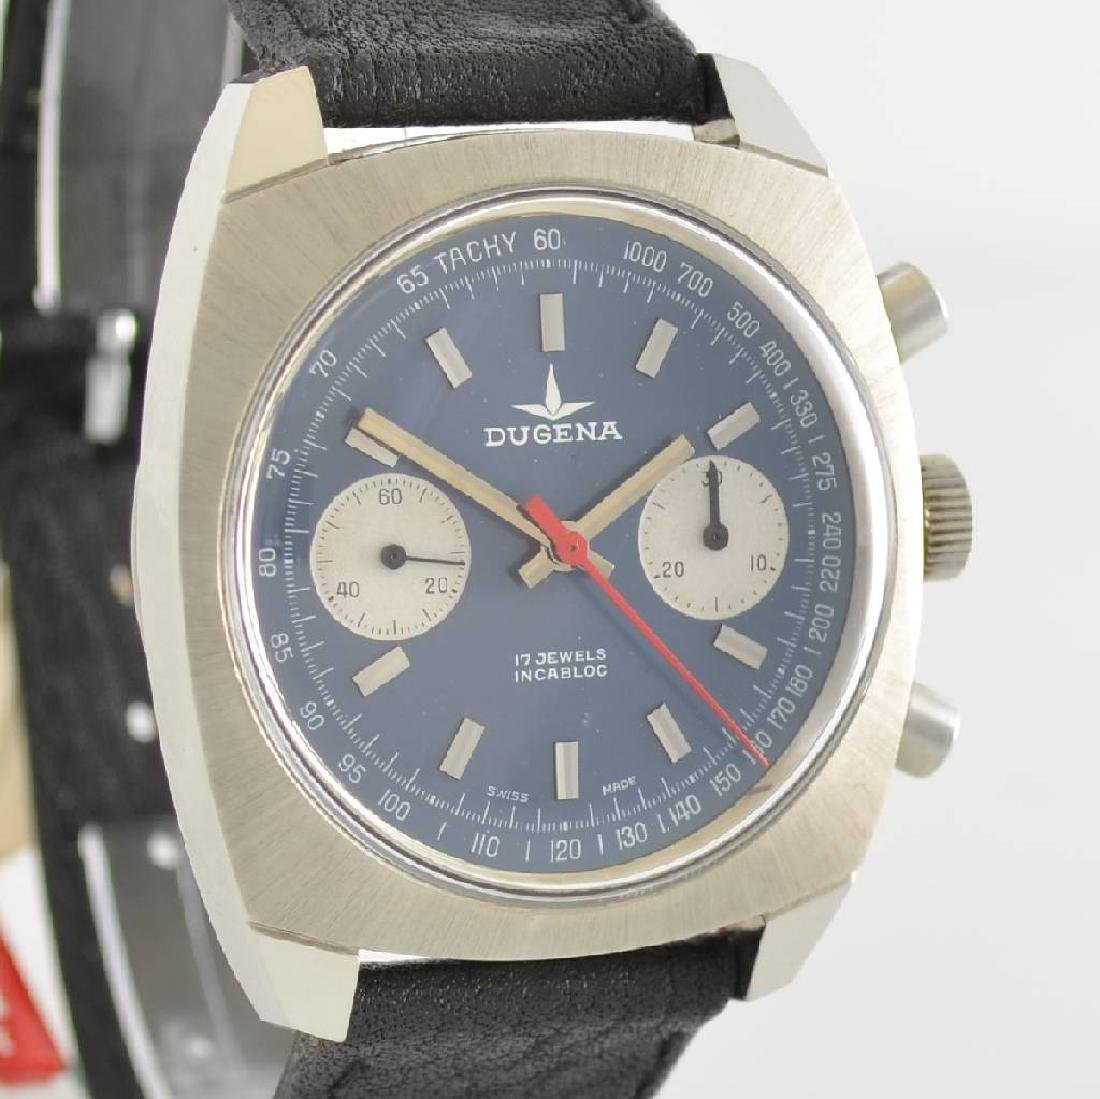 DUGENA unworn gents wristwatch with chronograph - 6